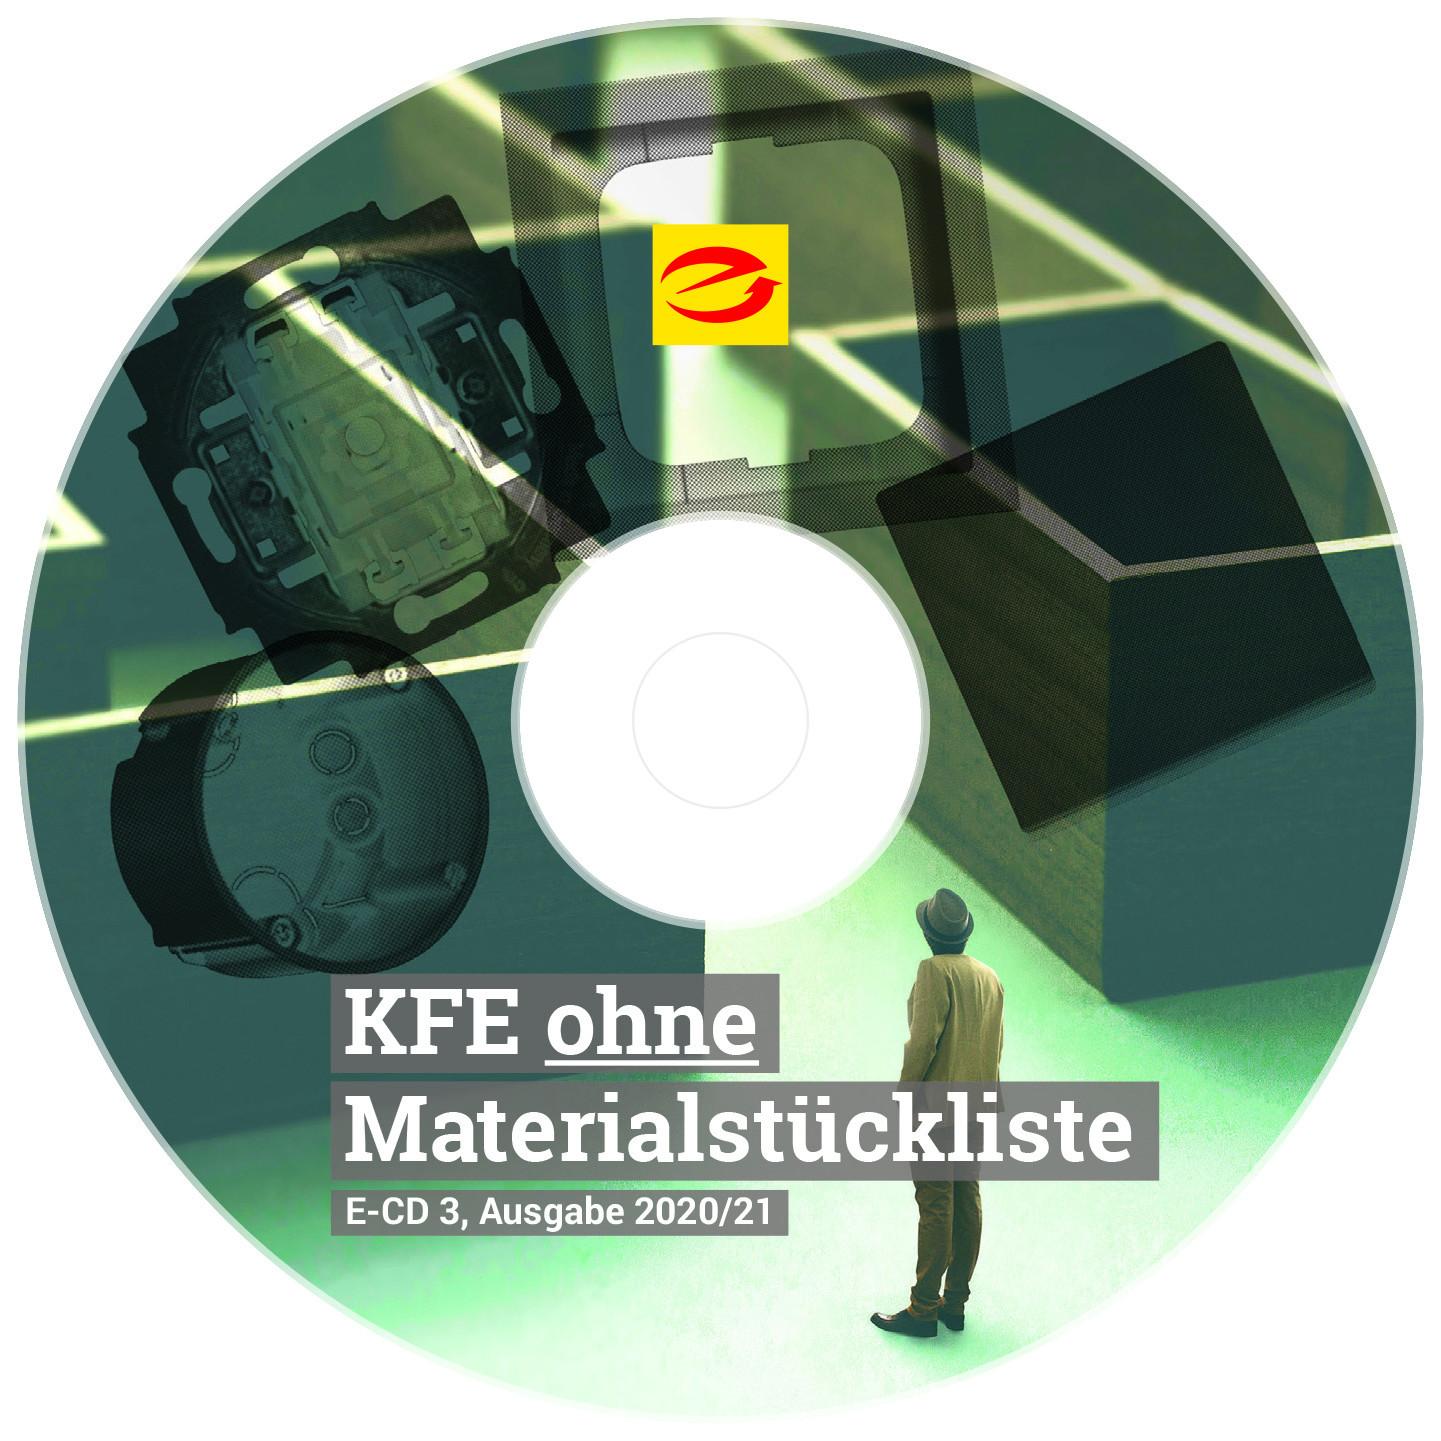 E-CD 3 Kalkulationshilfe Standardversion 2020 / 21 (Lieferung ab Juli/August 2020)